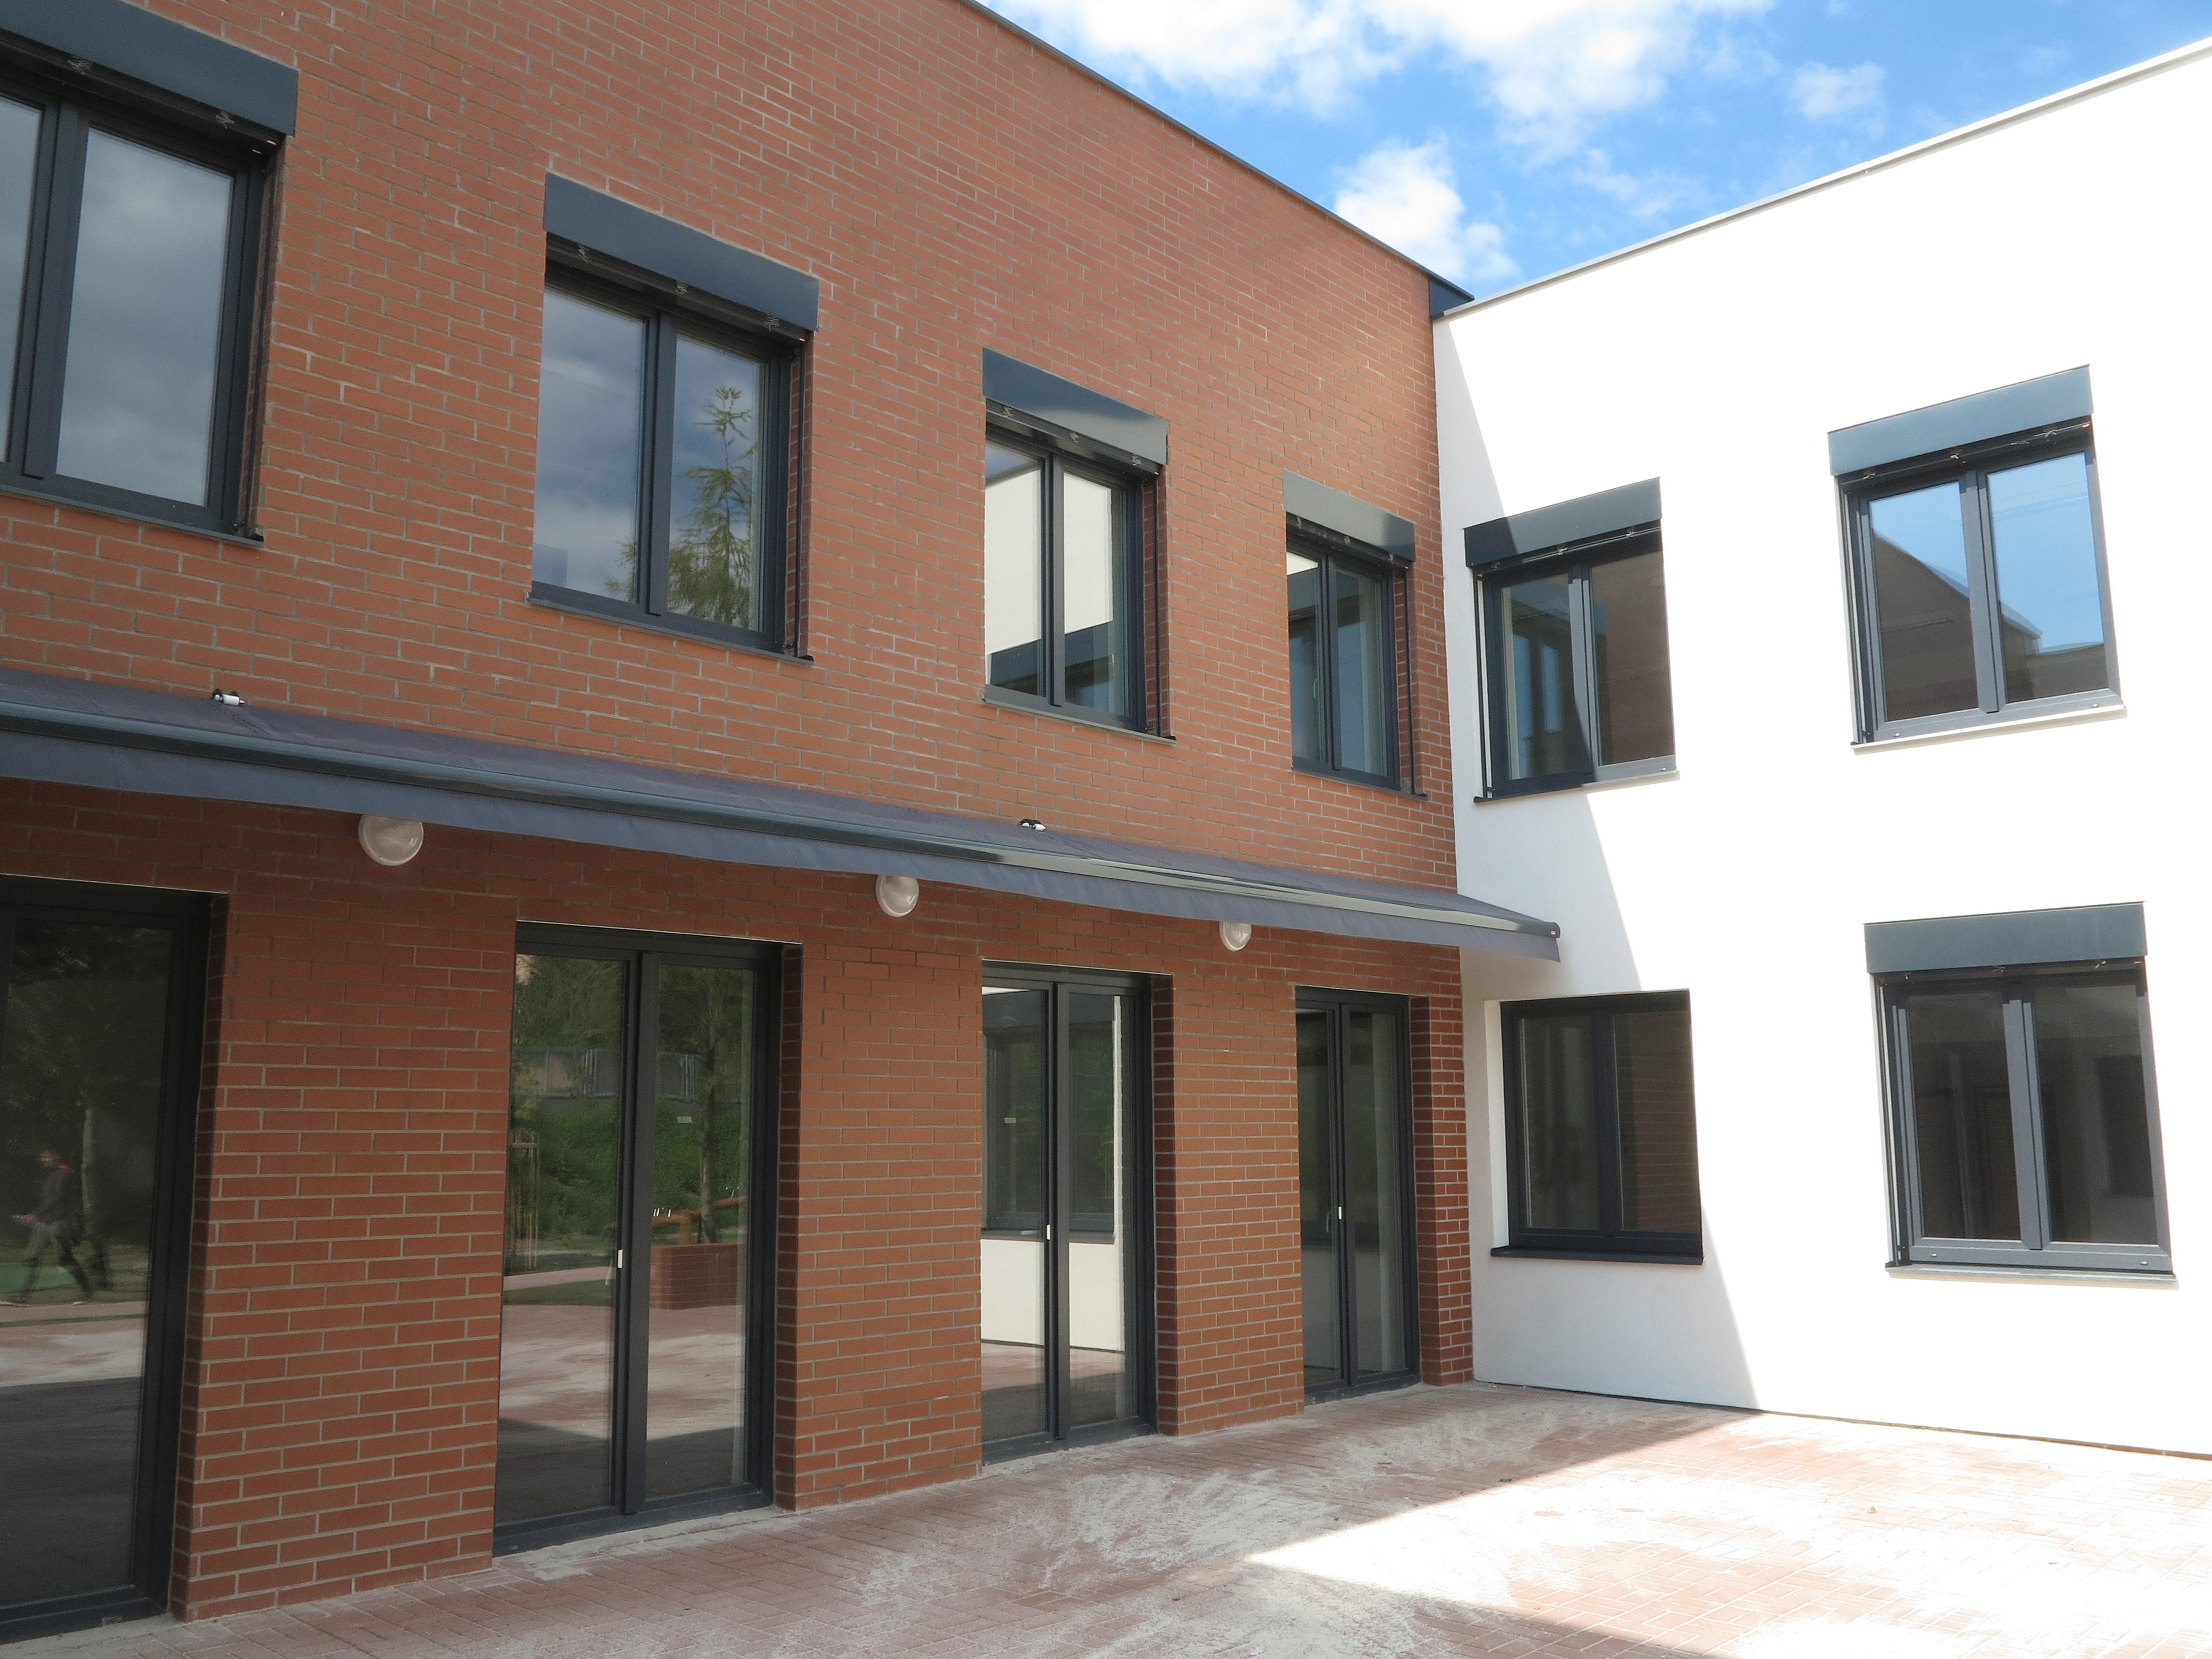 rekonstrukce-zahorskeho-top-investice-na-barrandove